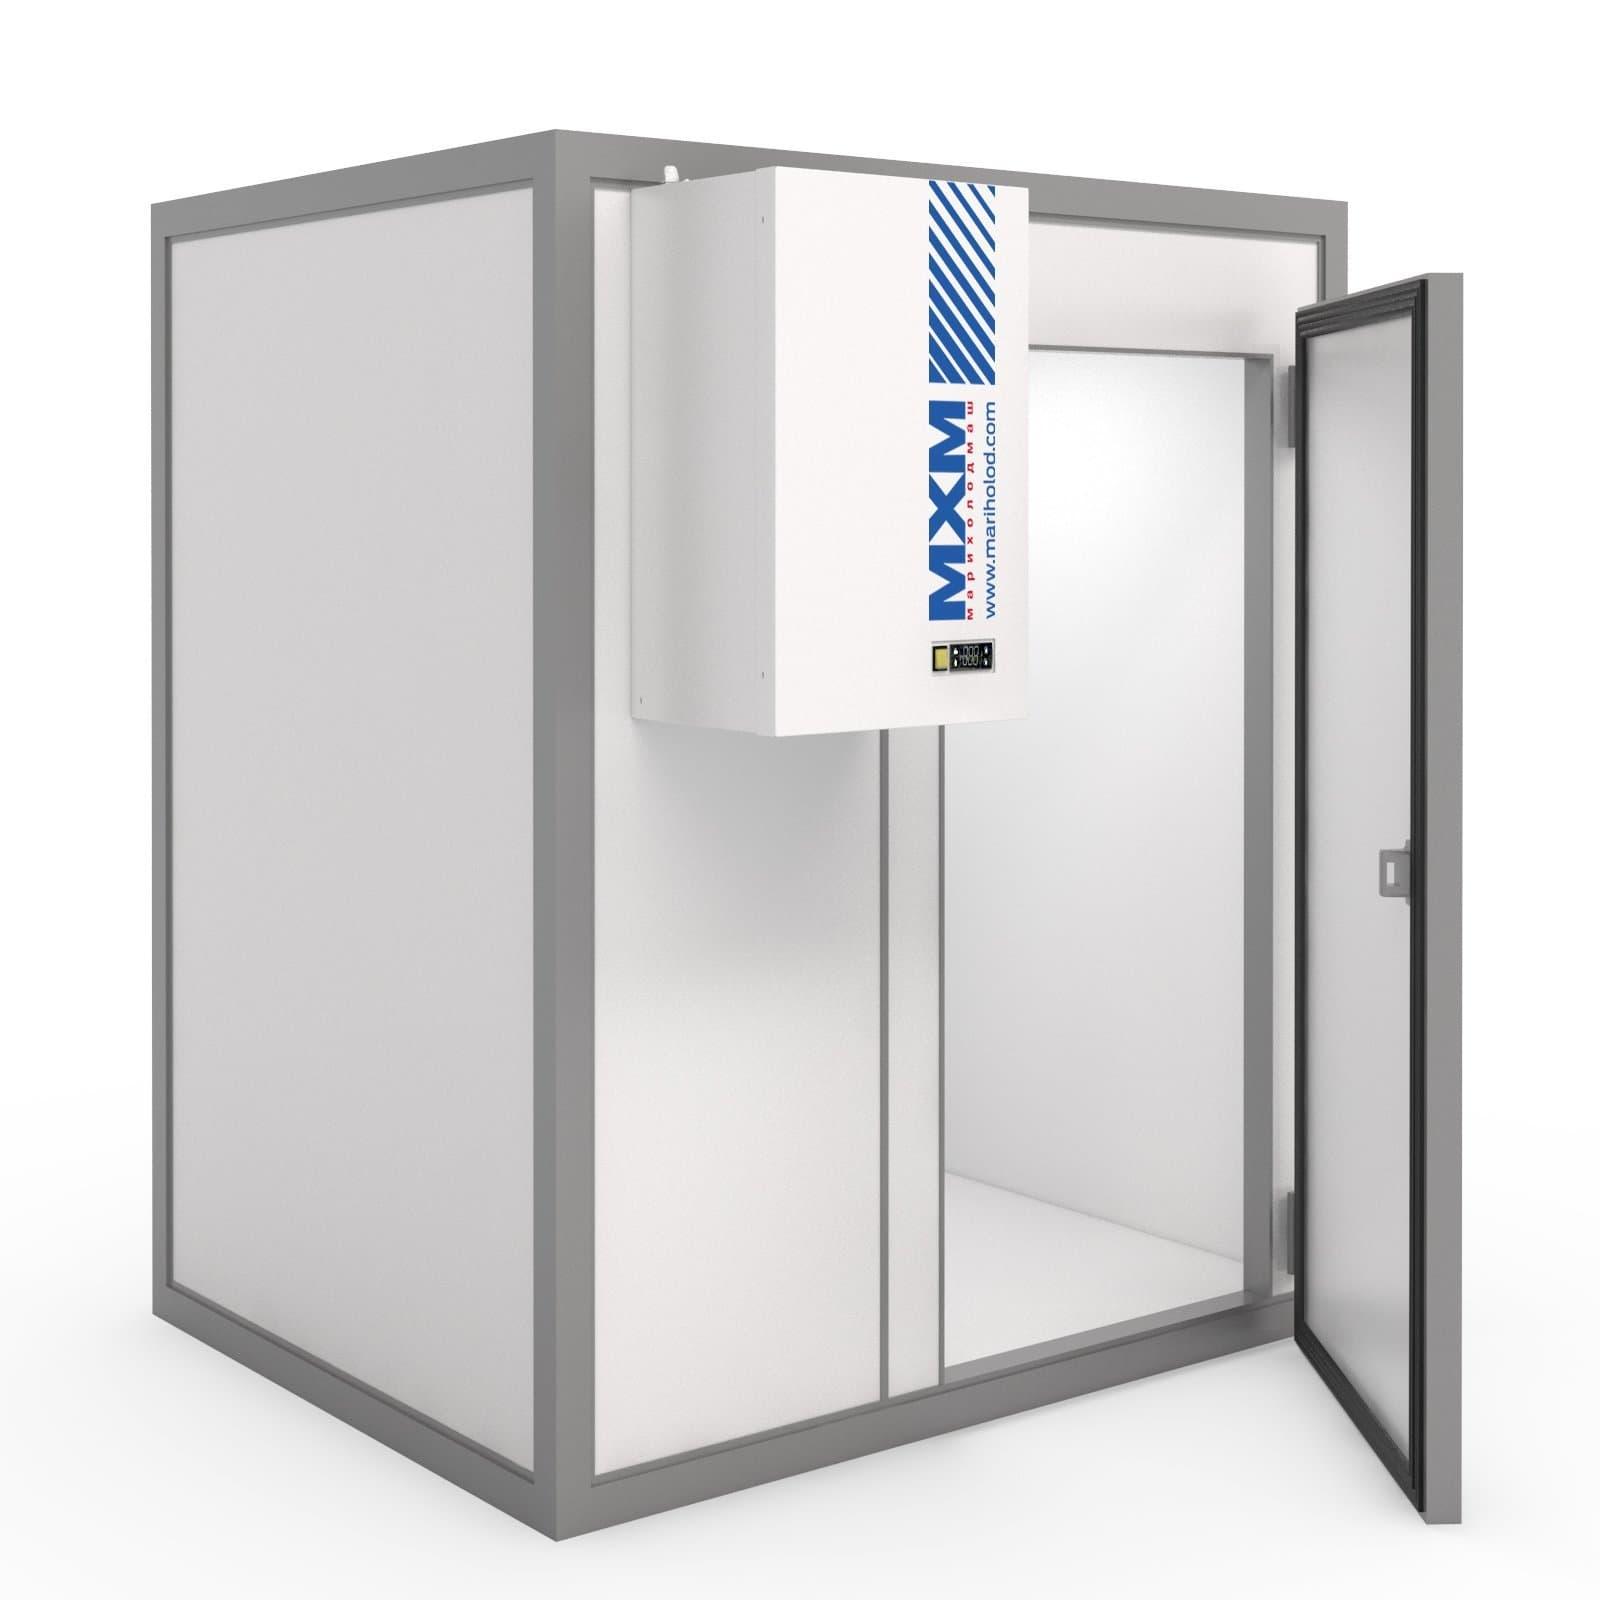 Камера холодильная МХМ КХН-41,47 1660×10960×2720